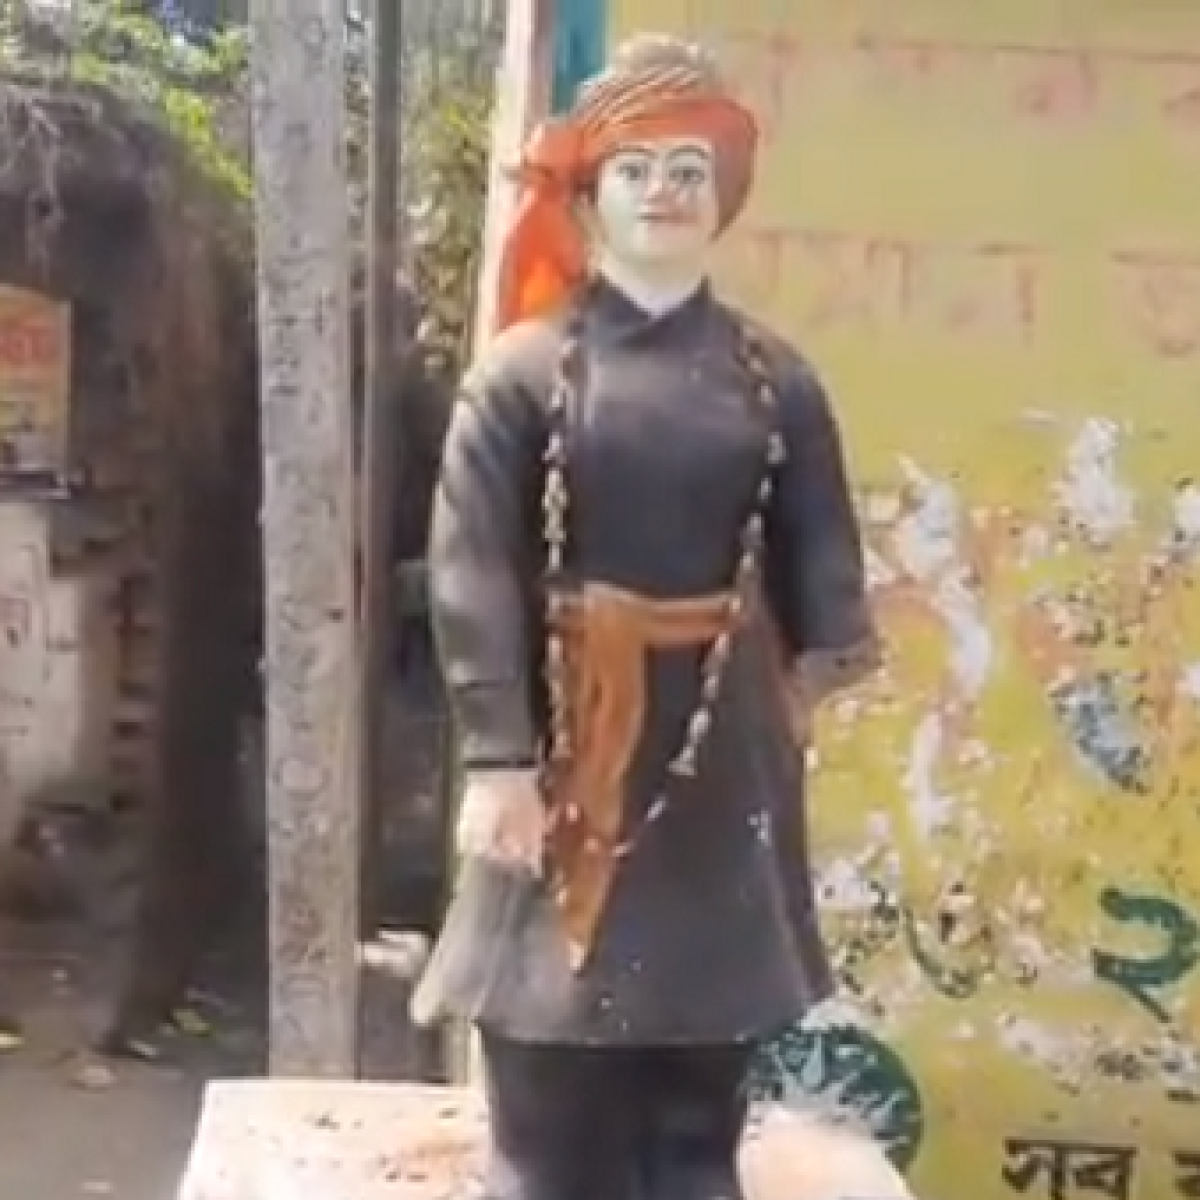 West Bengal: Swami Vivekananda's statue vandalised in Murshidabad district